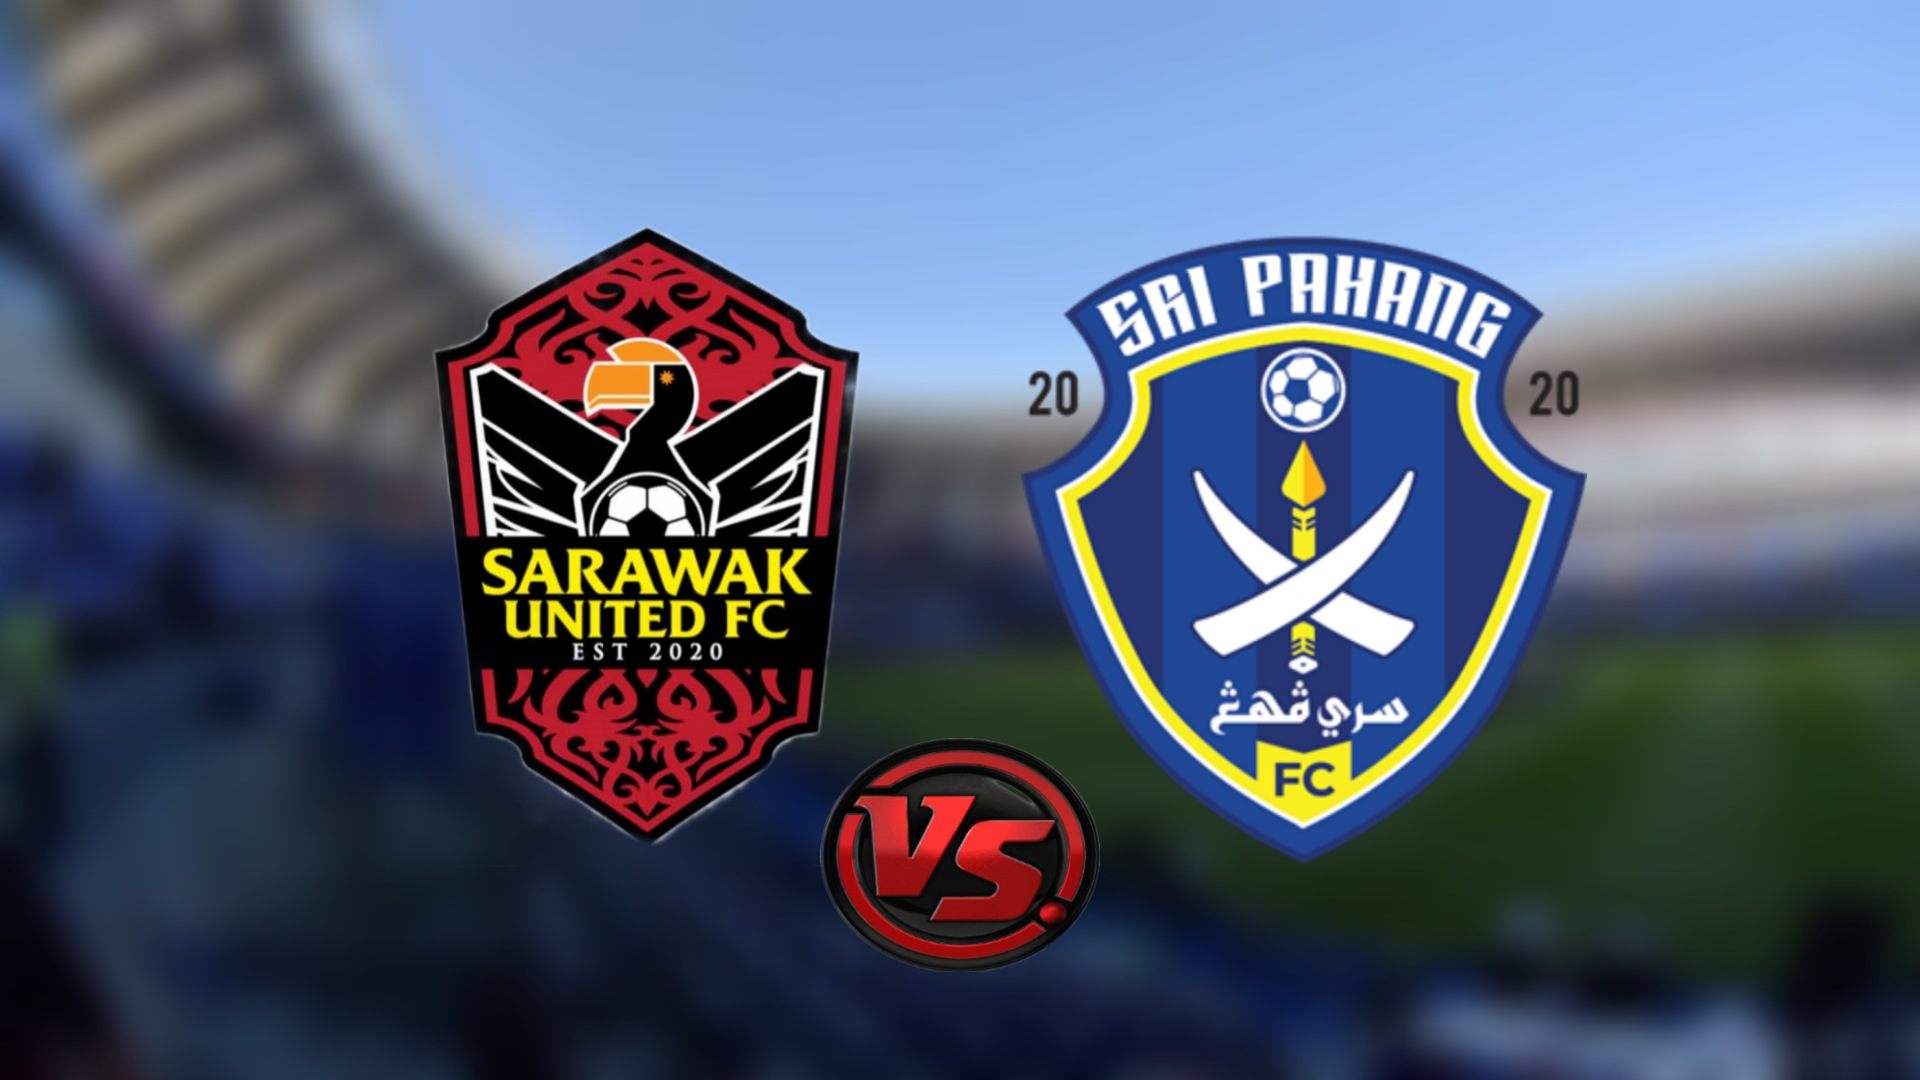 Live Streaming Sarawak United FC vs Sri Pahang FC Piala Malaysia 29.9.2021